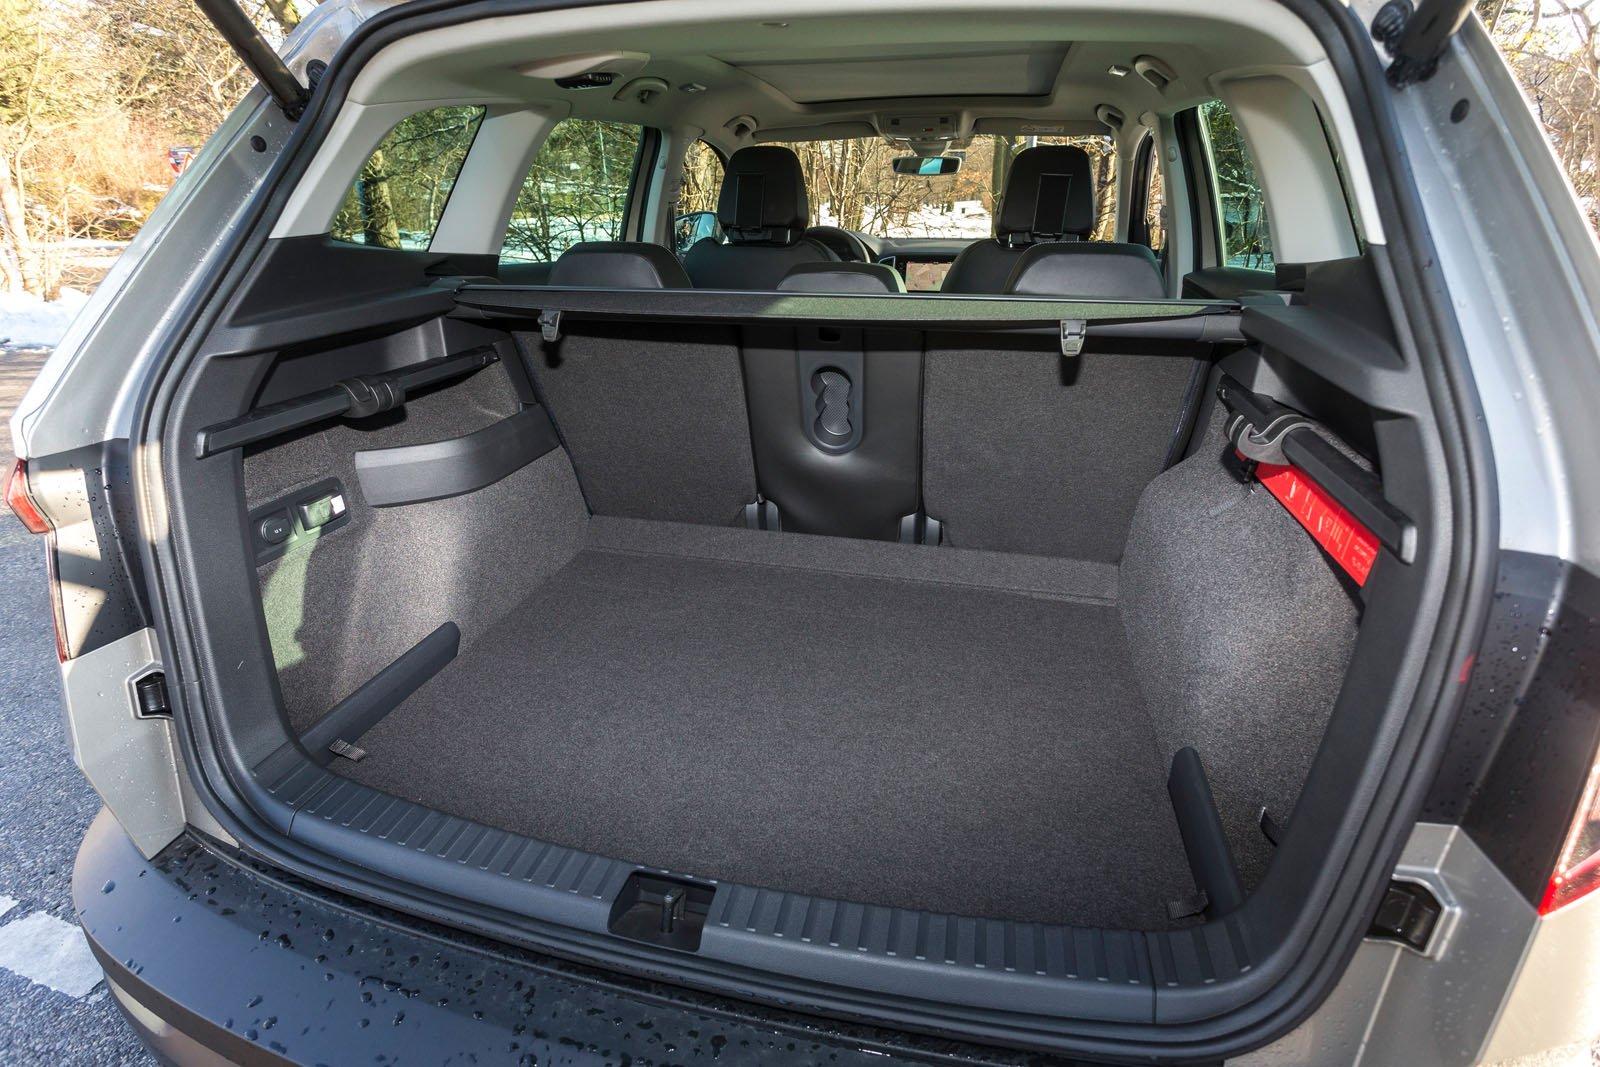 gro er test skoda karoq 2 0 tdi 4x4 dsg style alles auto. Black Bedroom Furniture Sets. Home Design Ideas